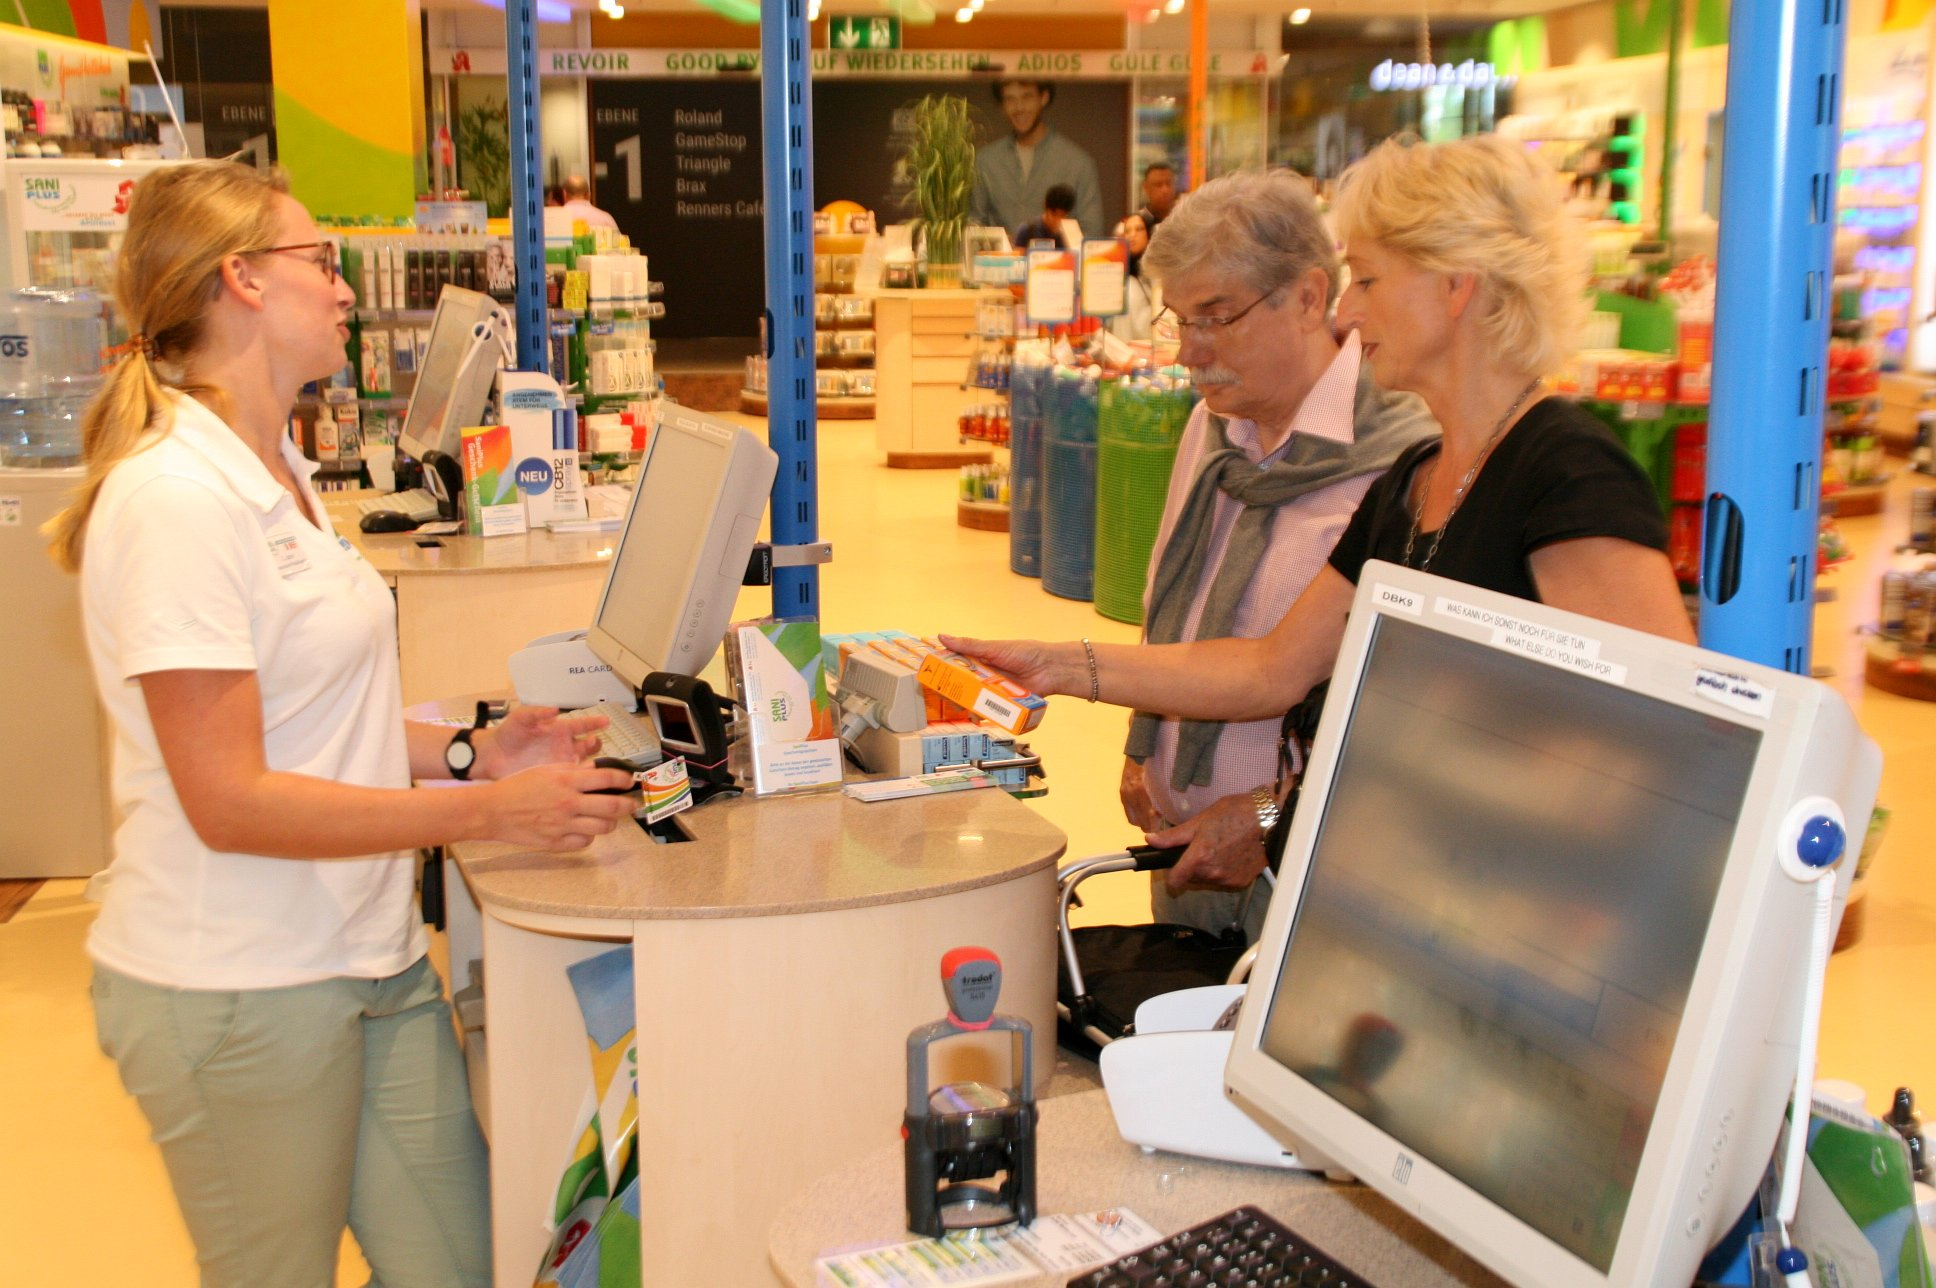 seniorenbetreuung-muenchen-lebensfreude-66-plus-medikament-einkauf